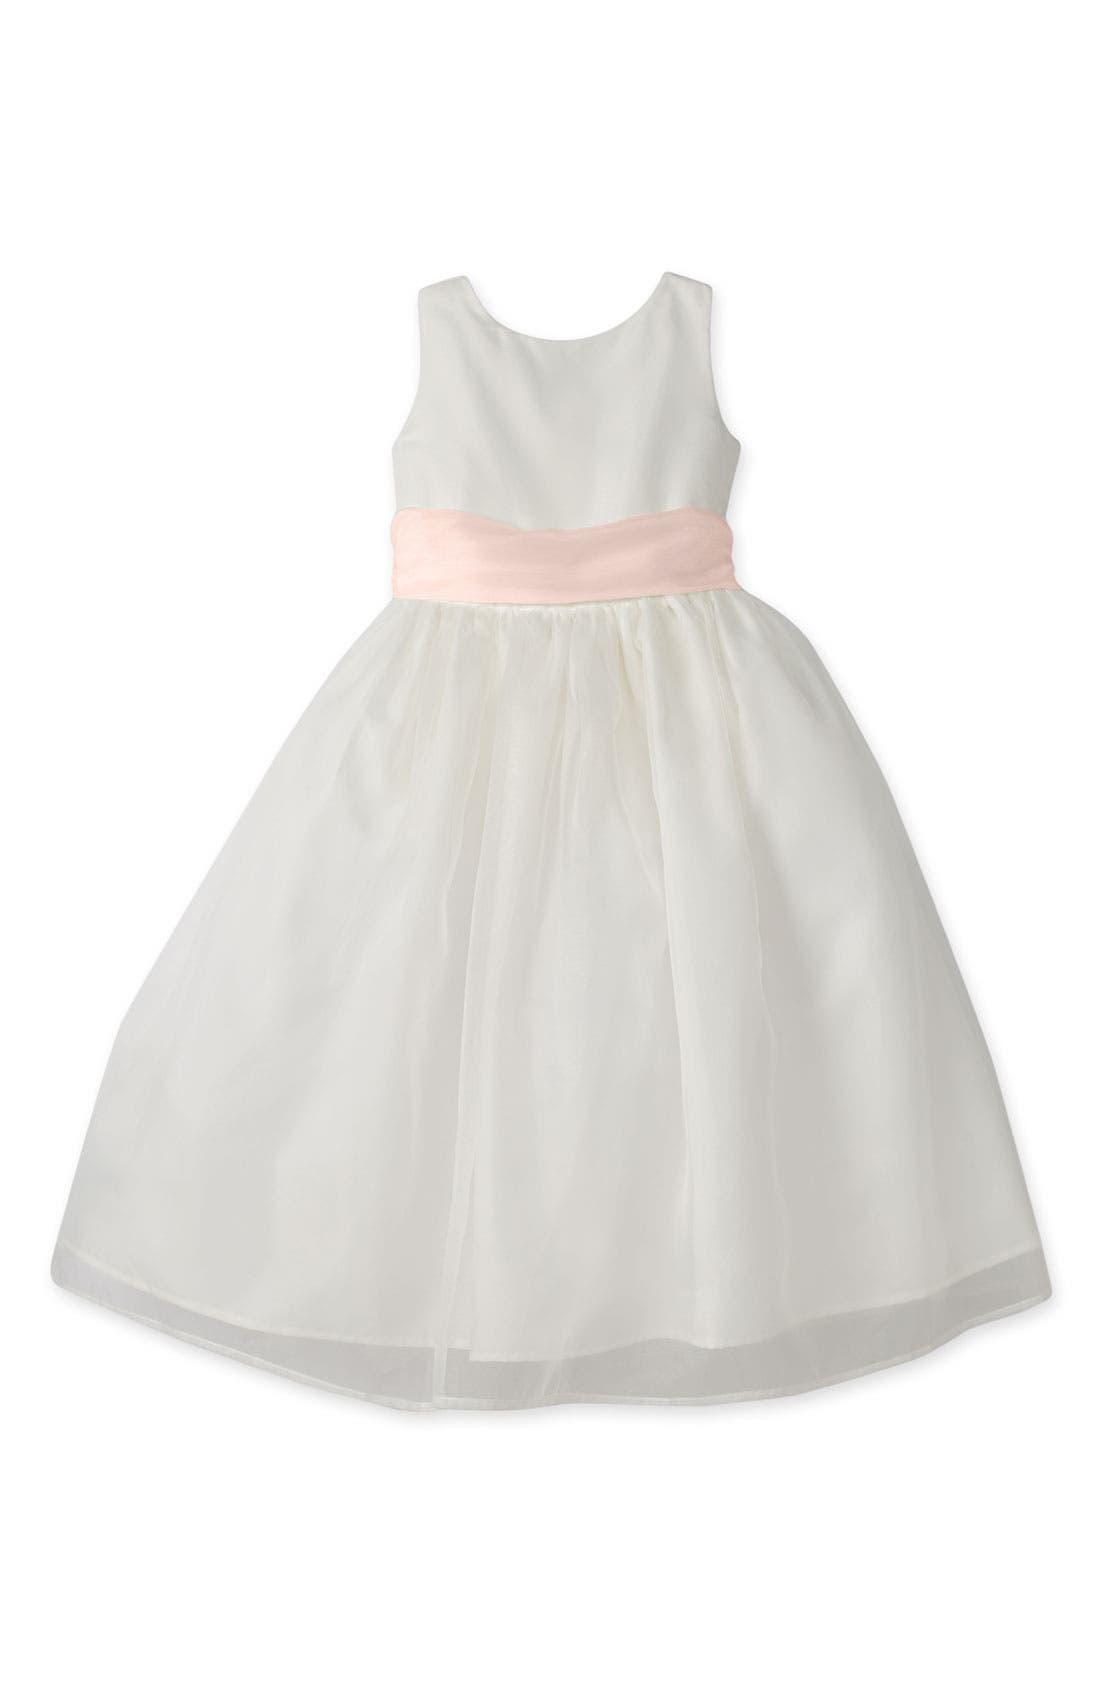 Main Image - Us Angels Sleeveless Organza Dress (Toddler Girls, Little Girls & Big Girls)